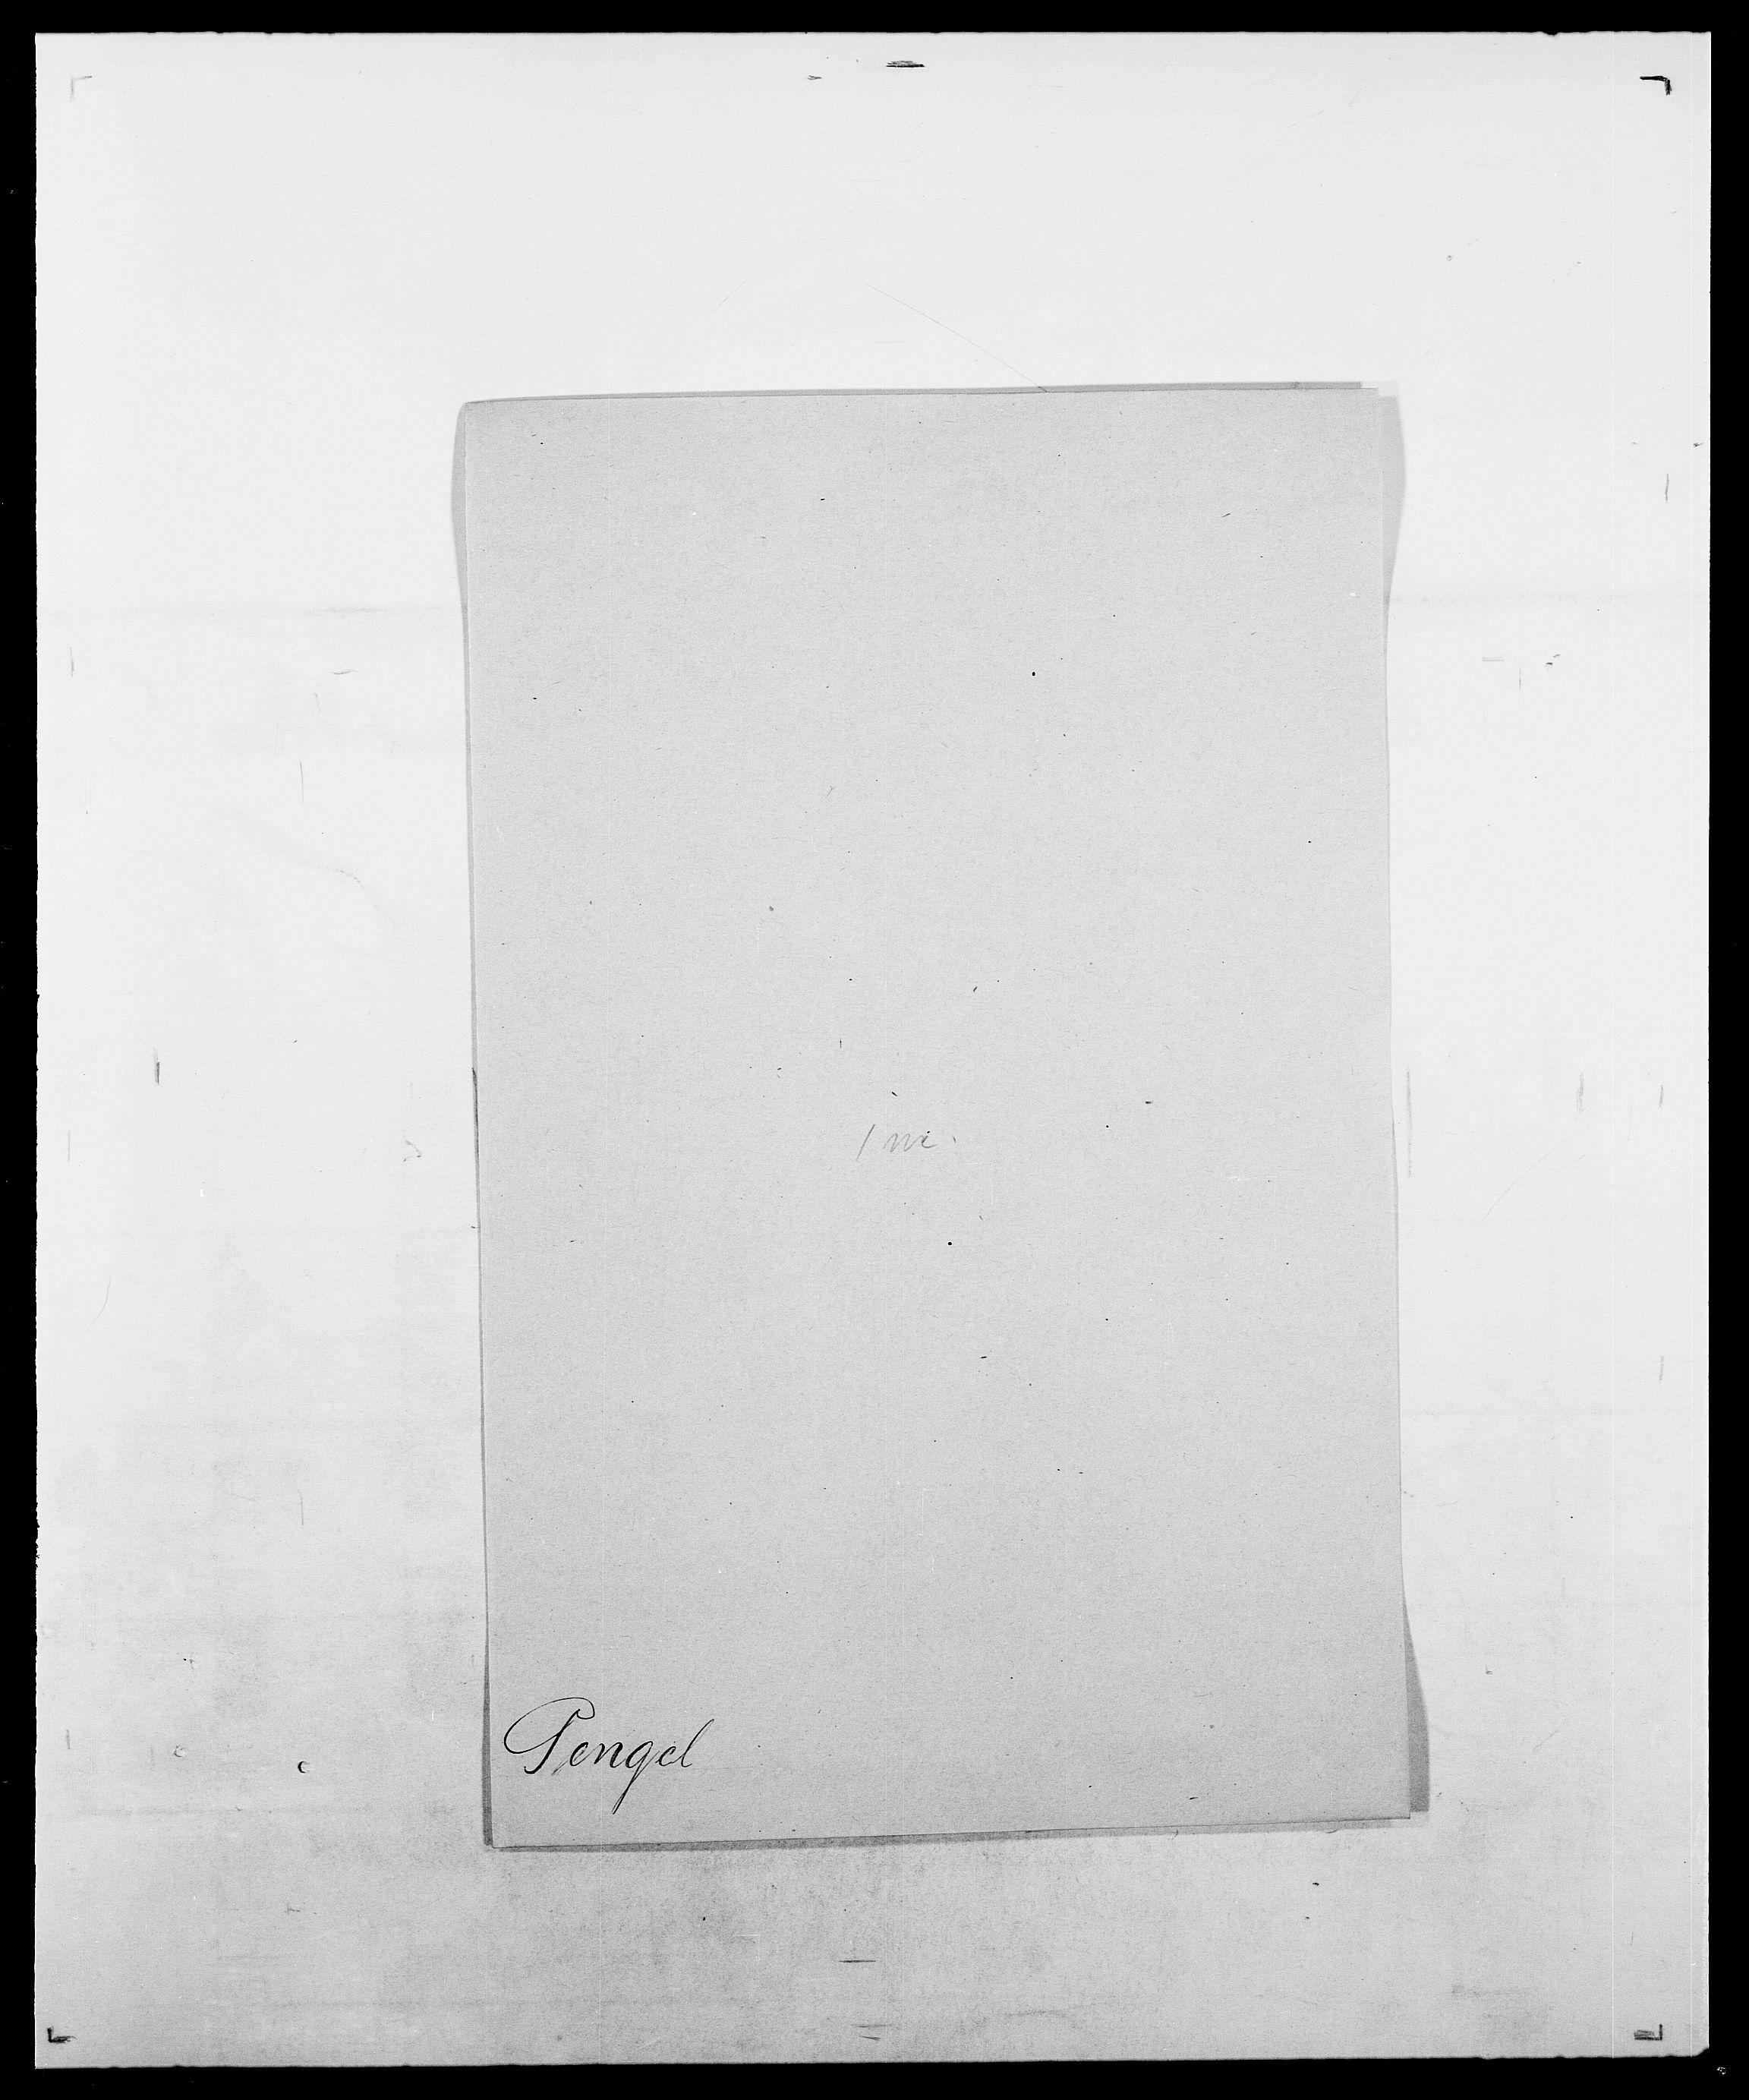 SAO, Delgobe, Charles Antoine - samling, D/Da/L0030: Paars - Pittelkov, s. 345